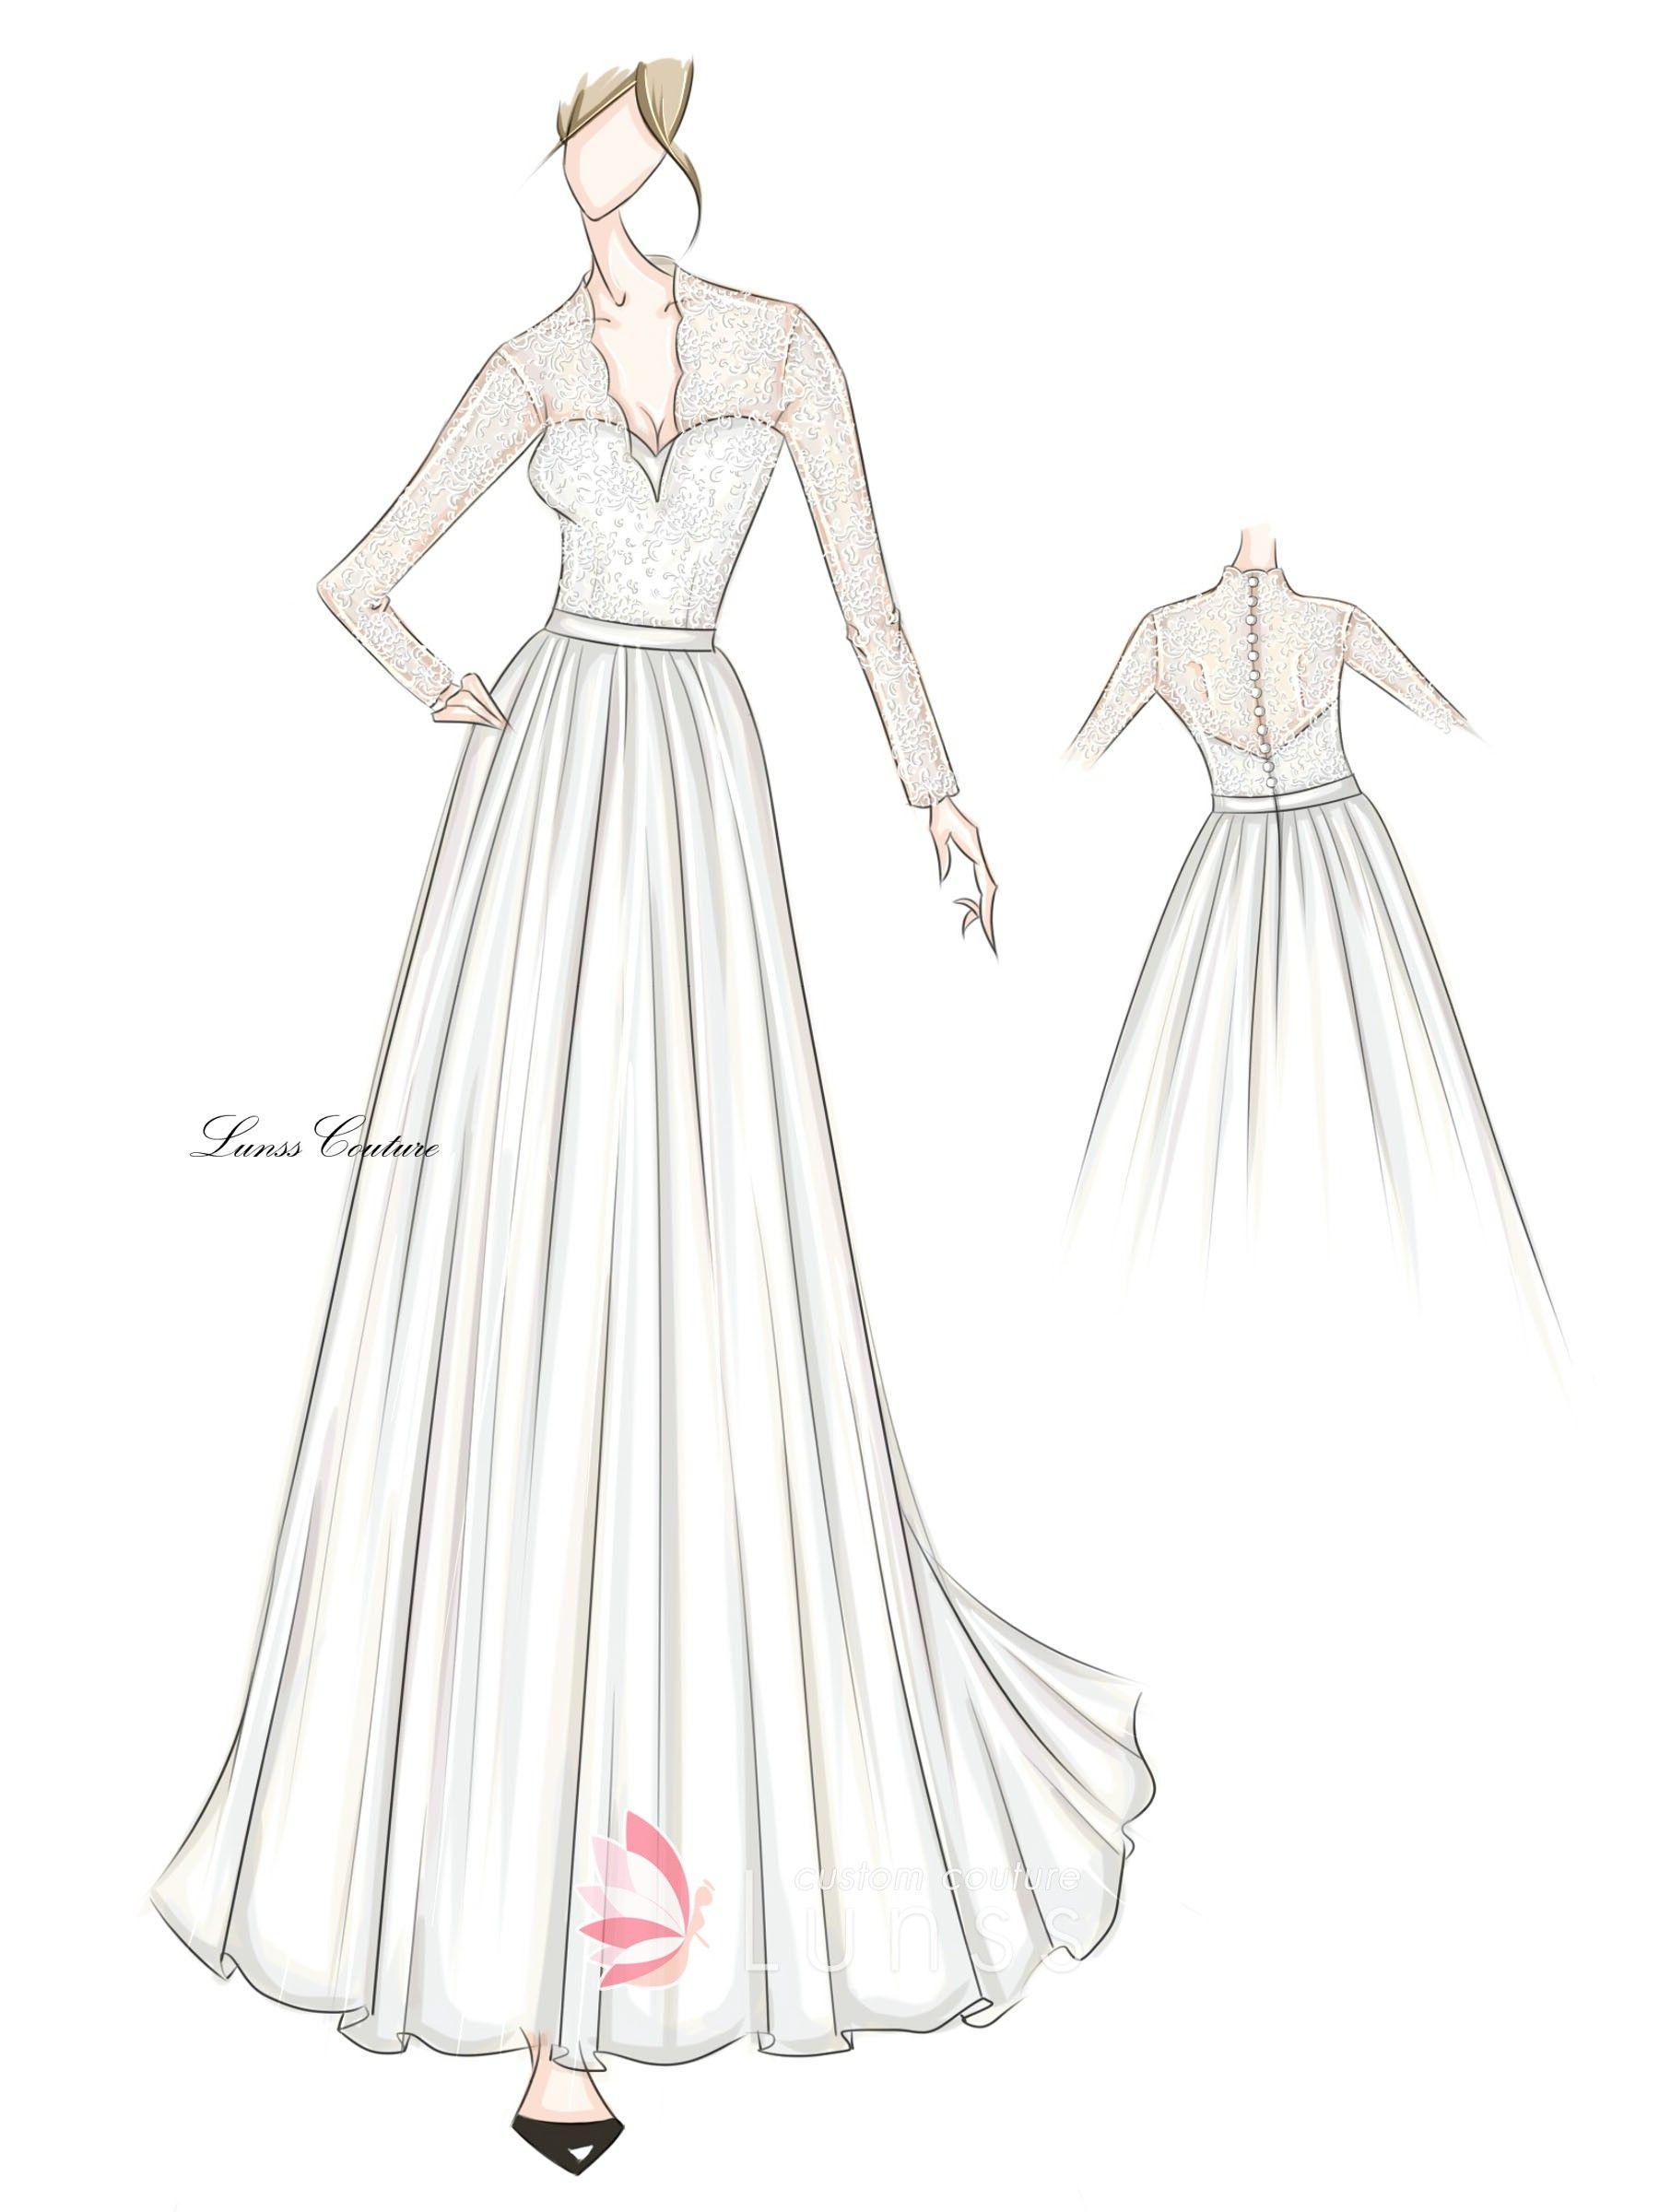 Long Sleeved Floor Length A Line Dress Sketch Dress Sketches Dress Drawing Dresses